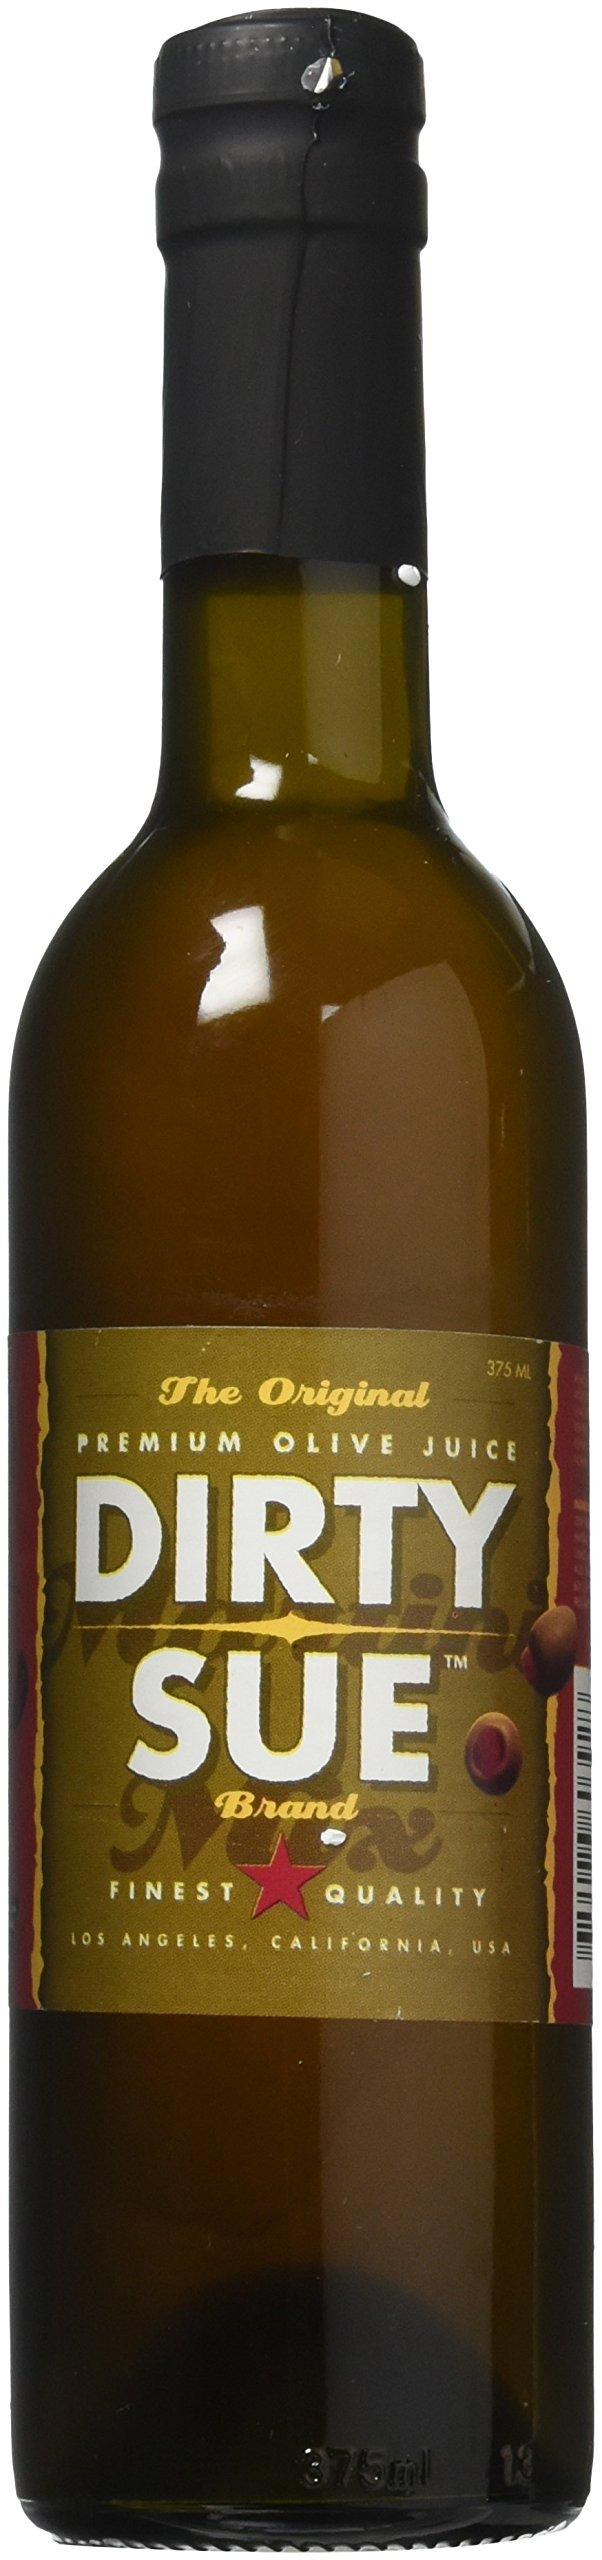 Drinking Bachelorette Bridal Martini Alcohol Bling Olive Outing Clubs Dry Shaken Stirred Up Brine Pick Shirt Style Scoop Neck V-Neck Crew Neck I Like It Dirty RHINESTONE T-Shirt Shirt Tee Bling